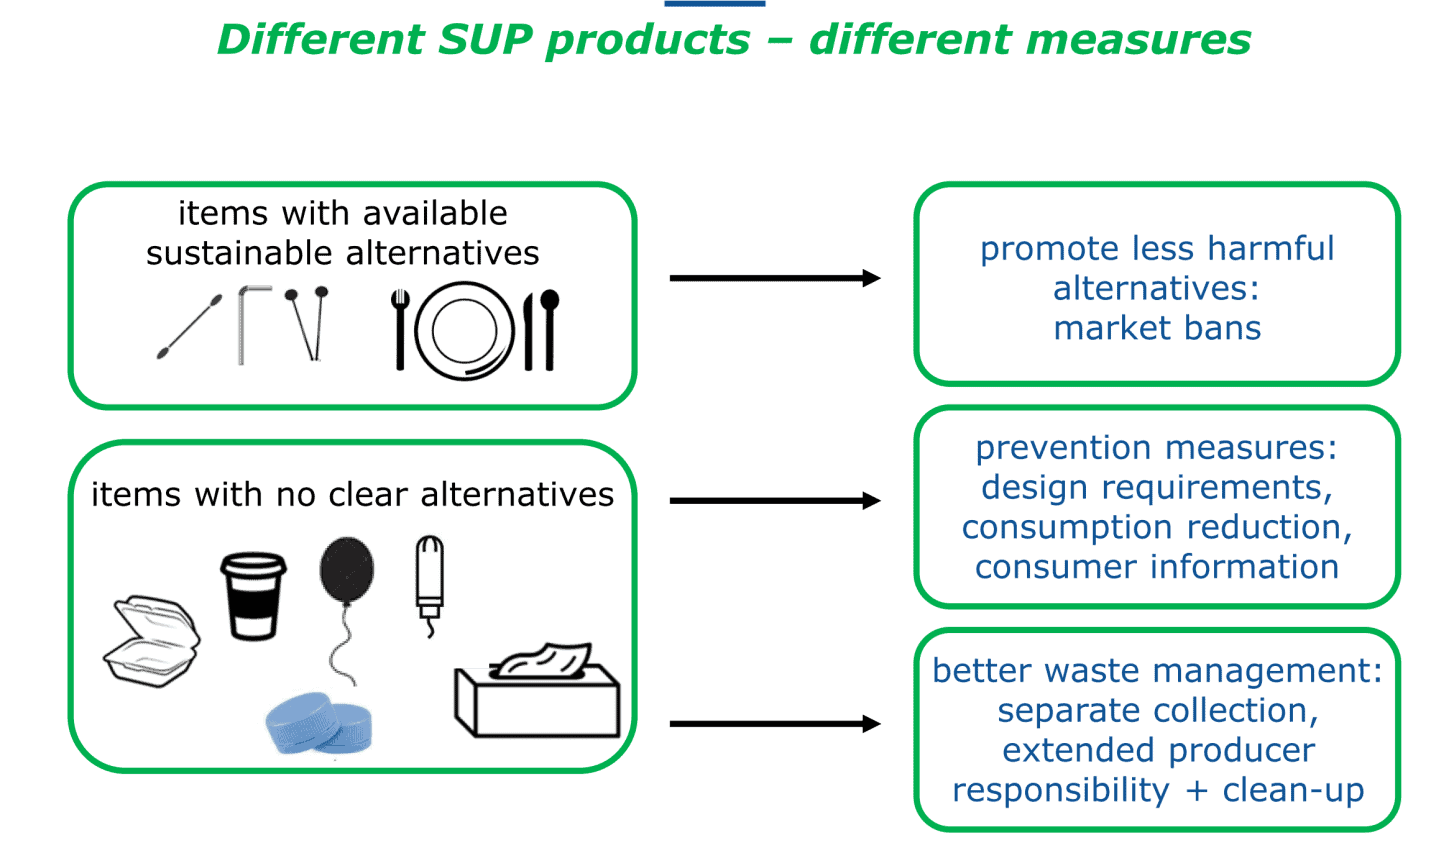 Legislation to promote the use of recycled plastics